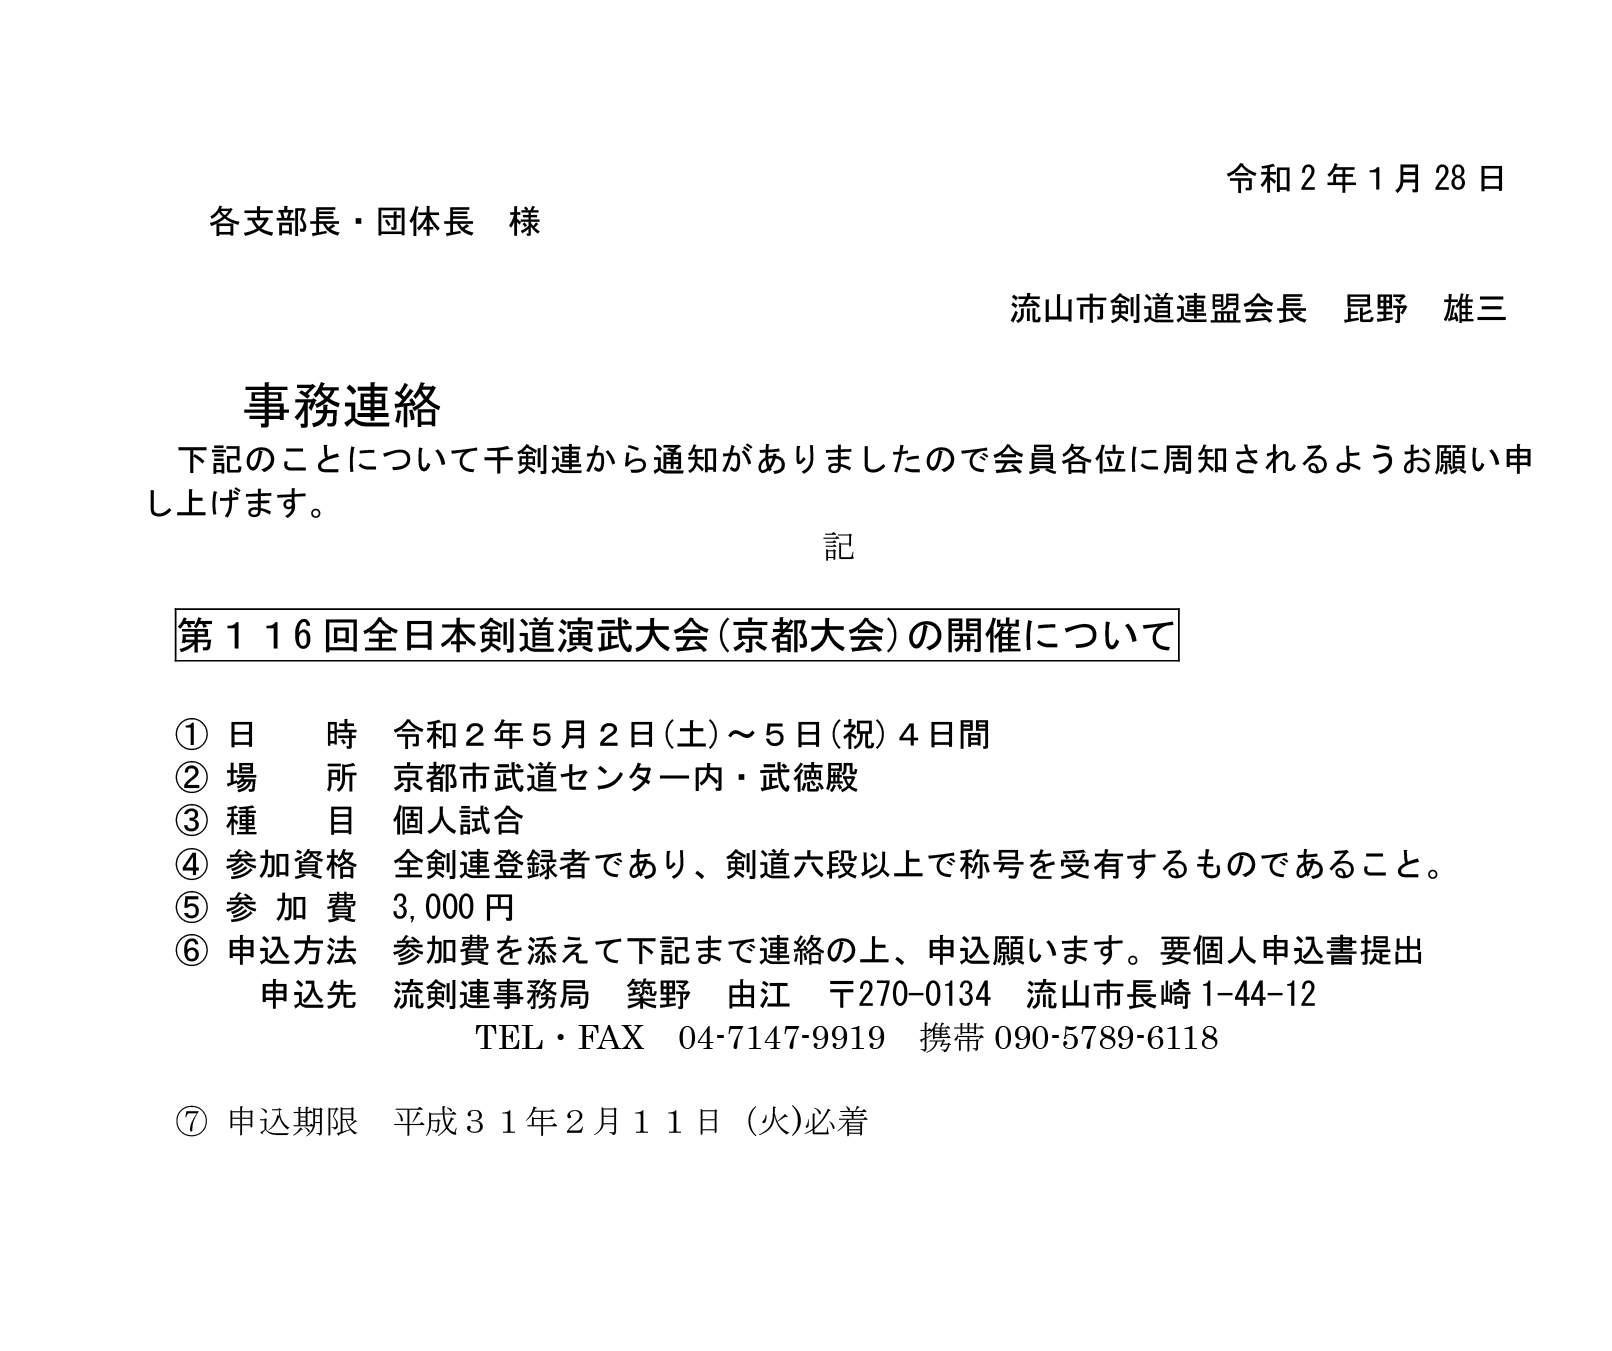 R2年京都大会申し込みについて_0001 (2)